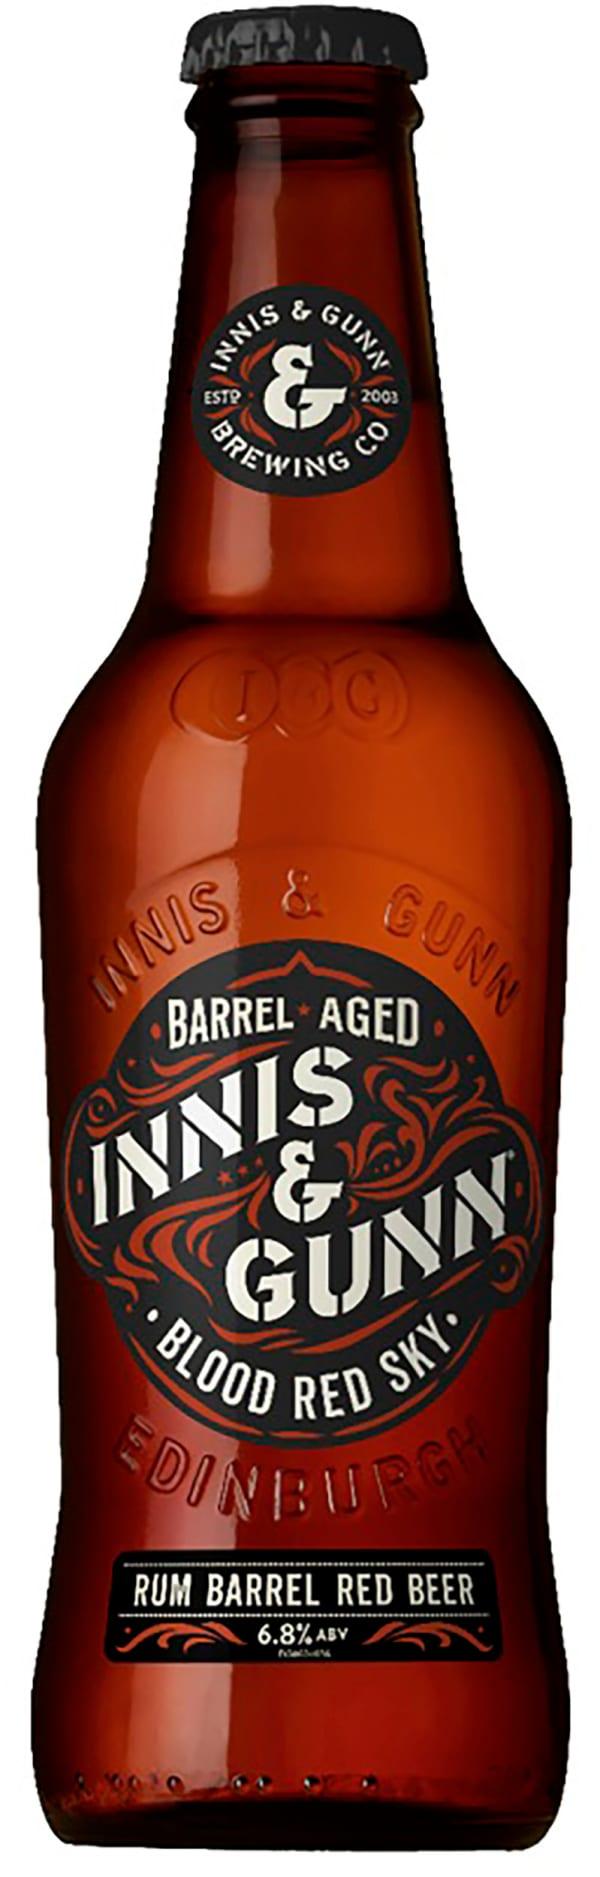 Innis & Gunn Blood Red Sky